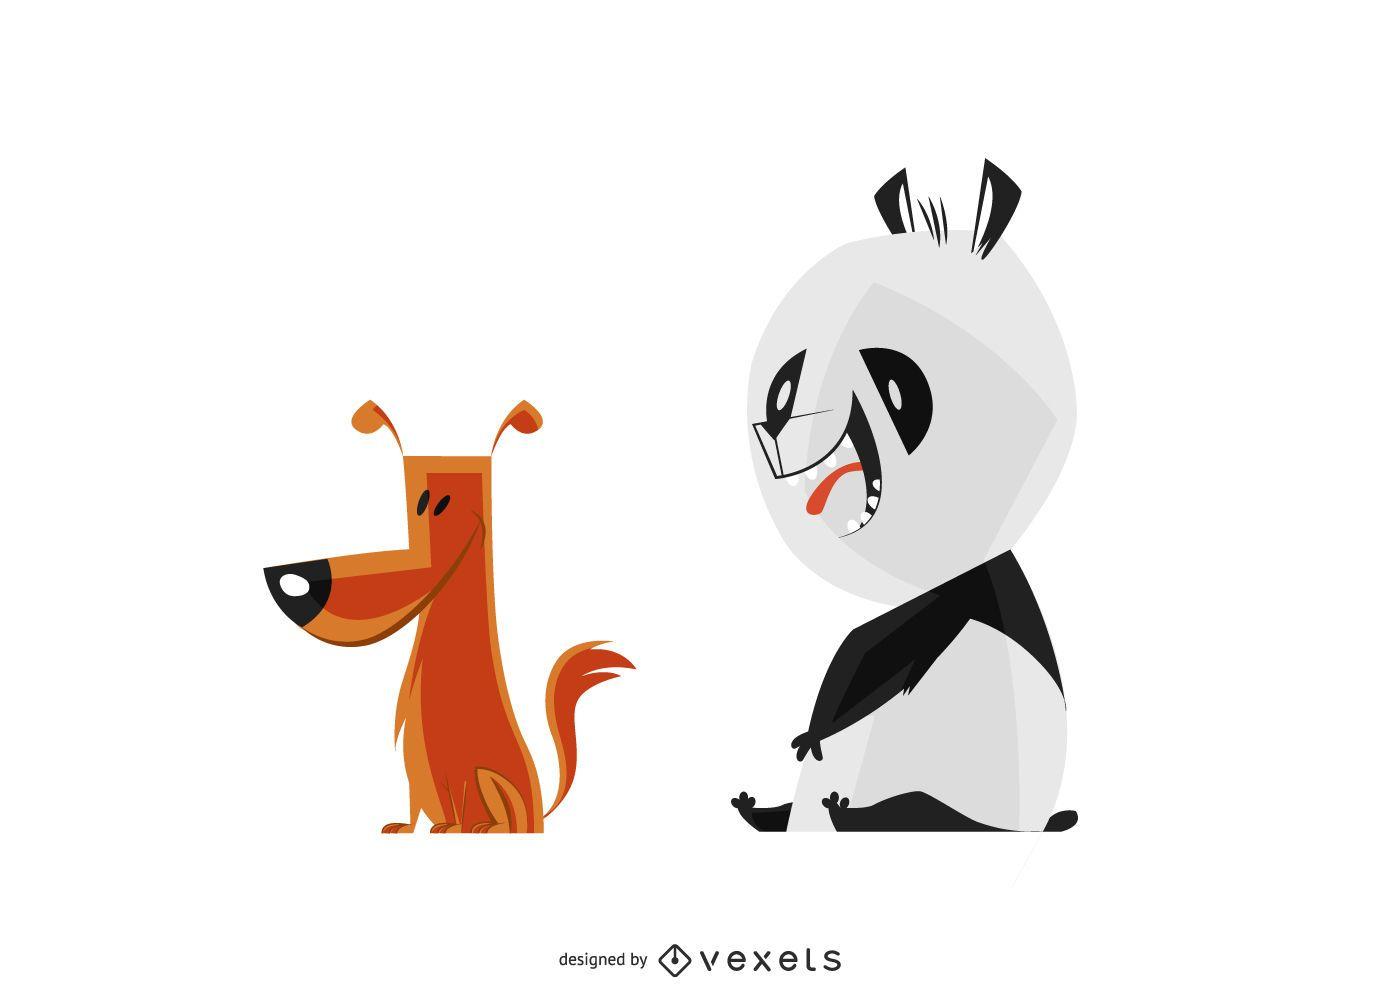 Dog & Panda Cartoon Illustration